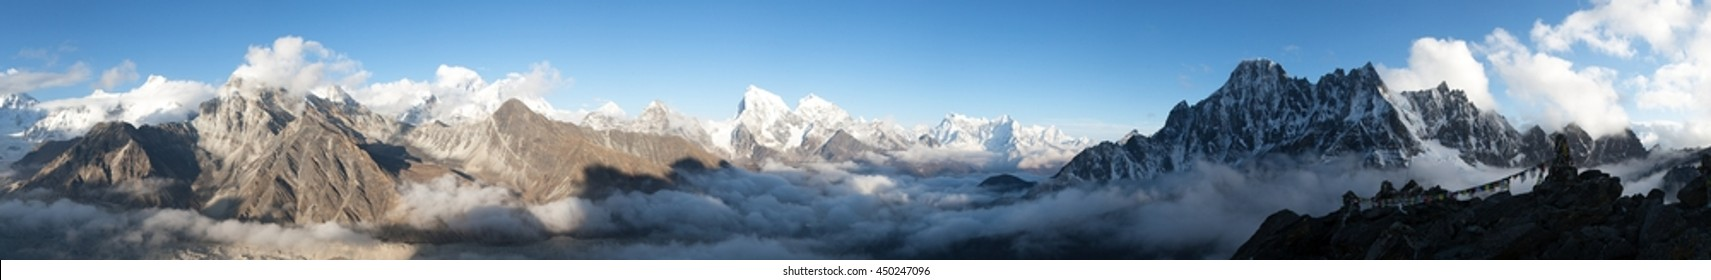 Evening panoramic view of Mount Everest, Lhotse and Makalu from Gokyo Ri - Khumbu valley, sagarmatha national park - Nepal